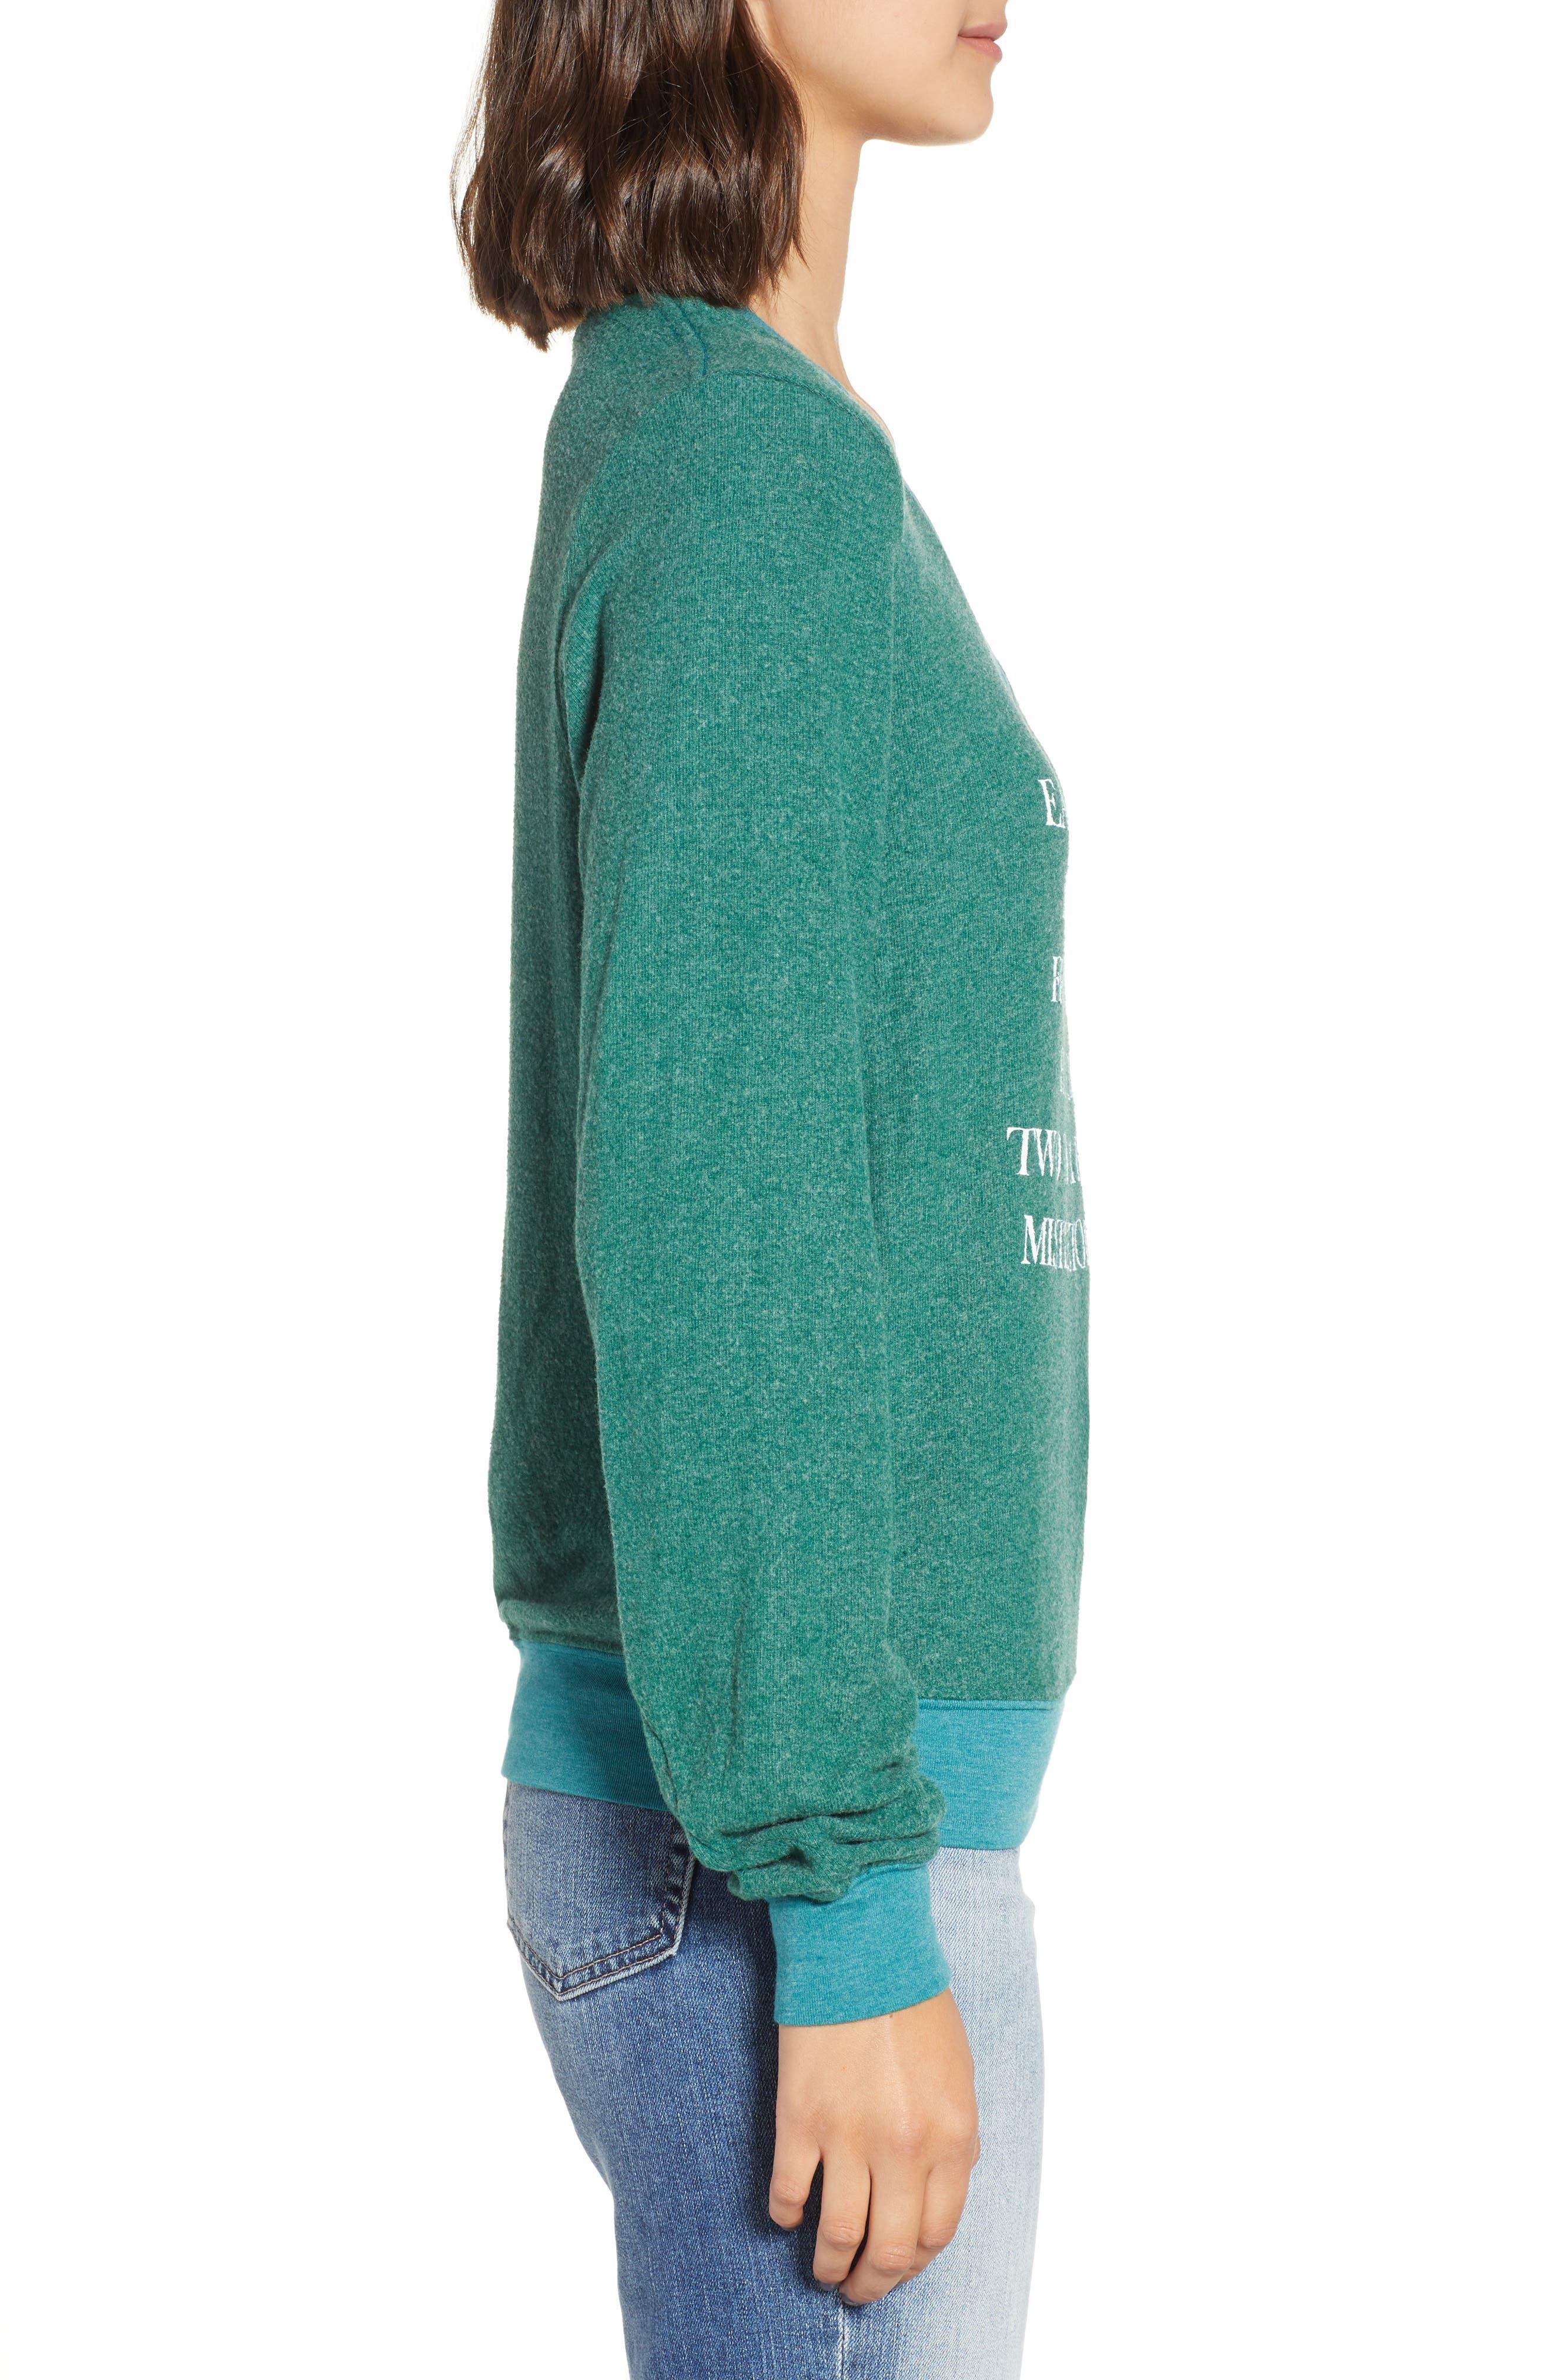 Mistletoe Kisses Sweater,                             Alternate thumbnail 3, color,                             WOODFALL GREEN